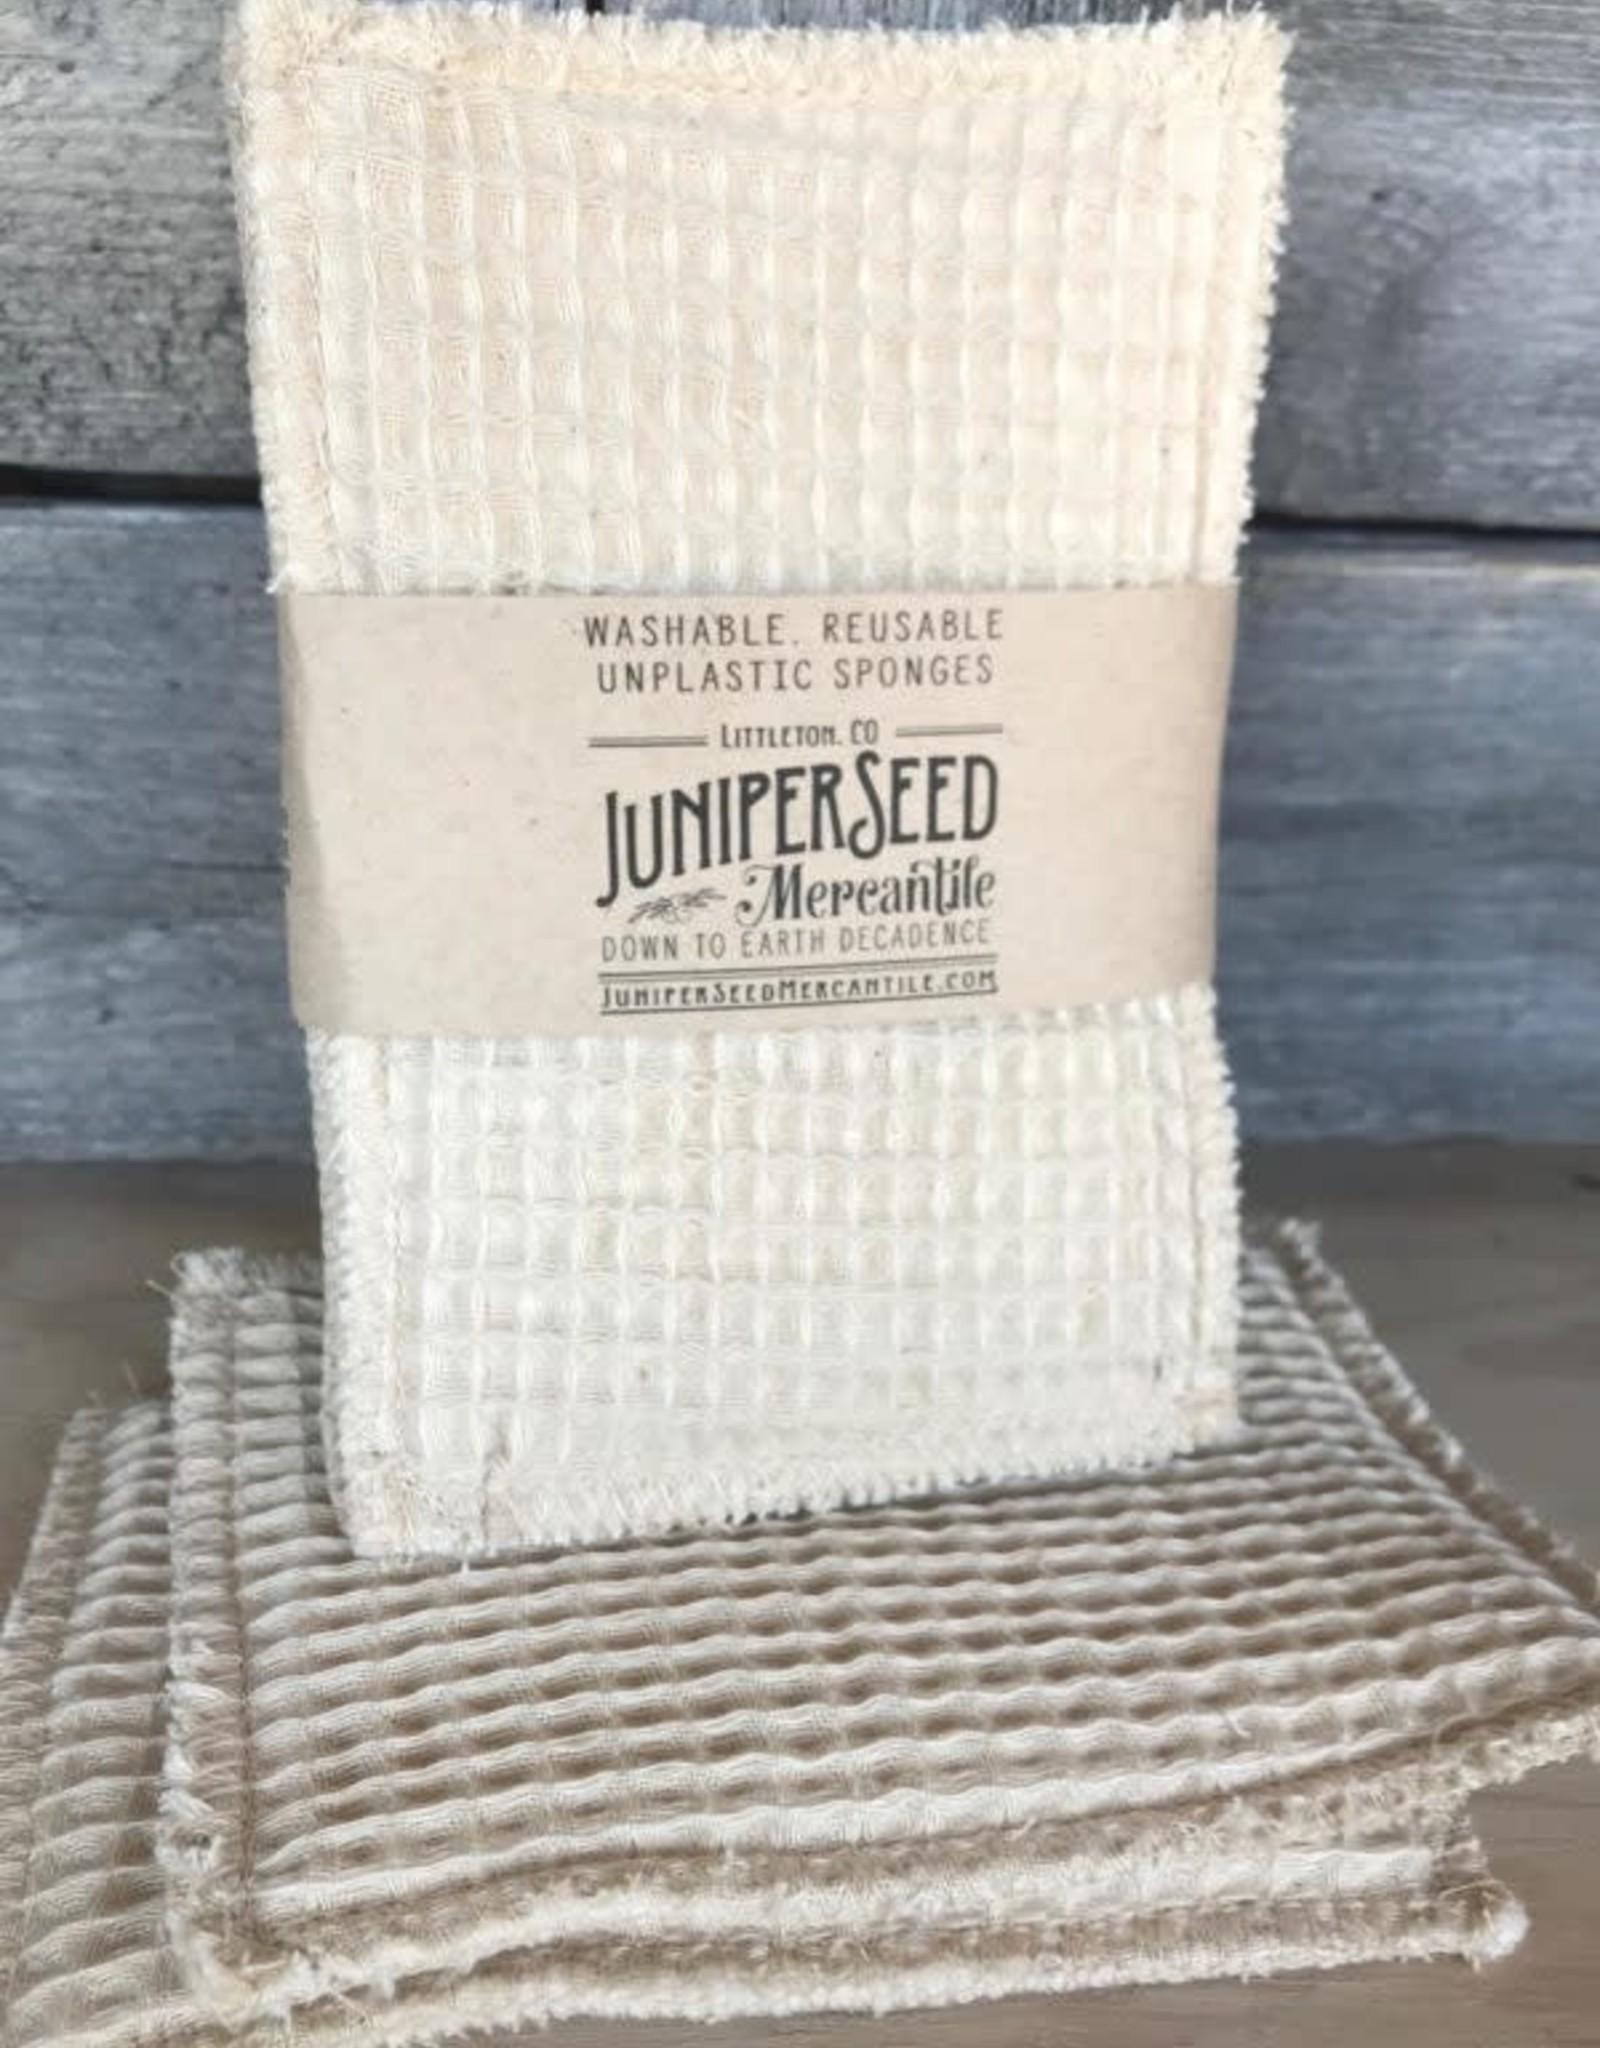 Reusable Unplastic Sponges